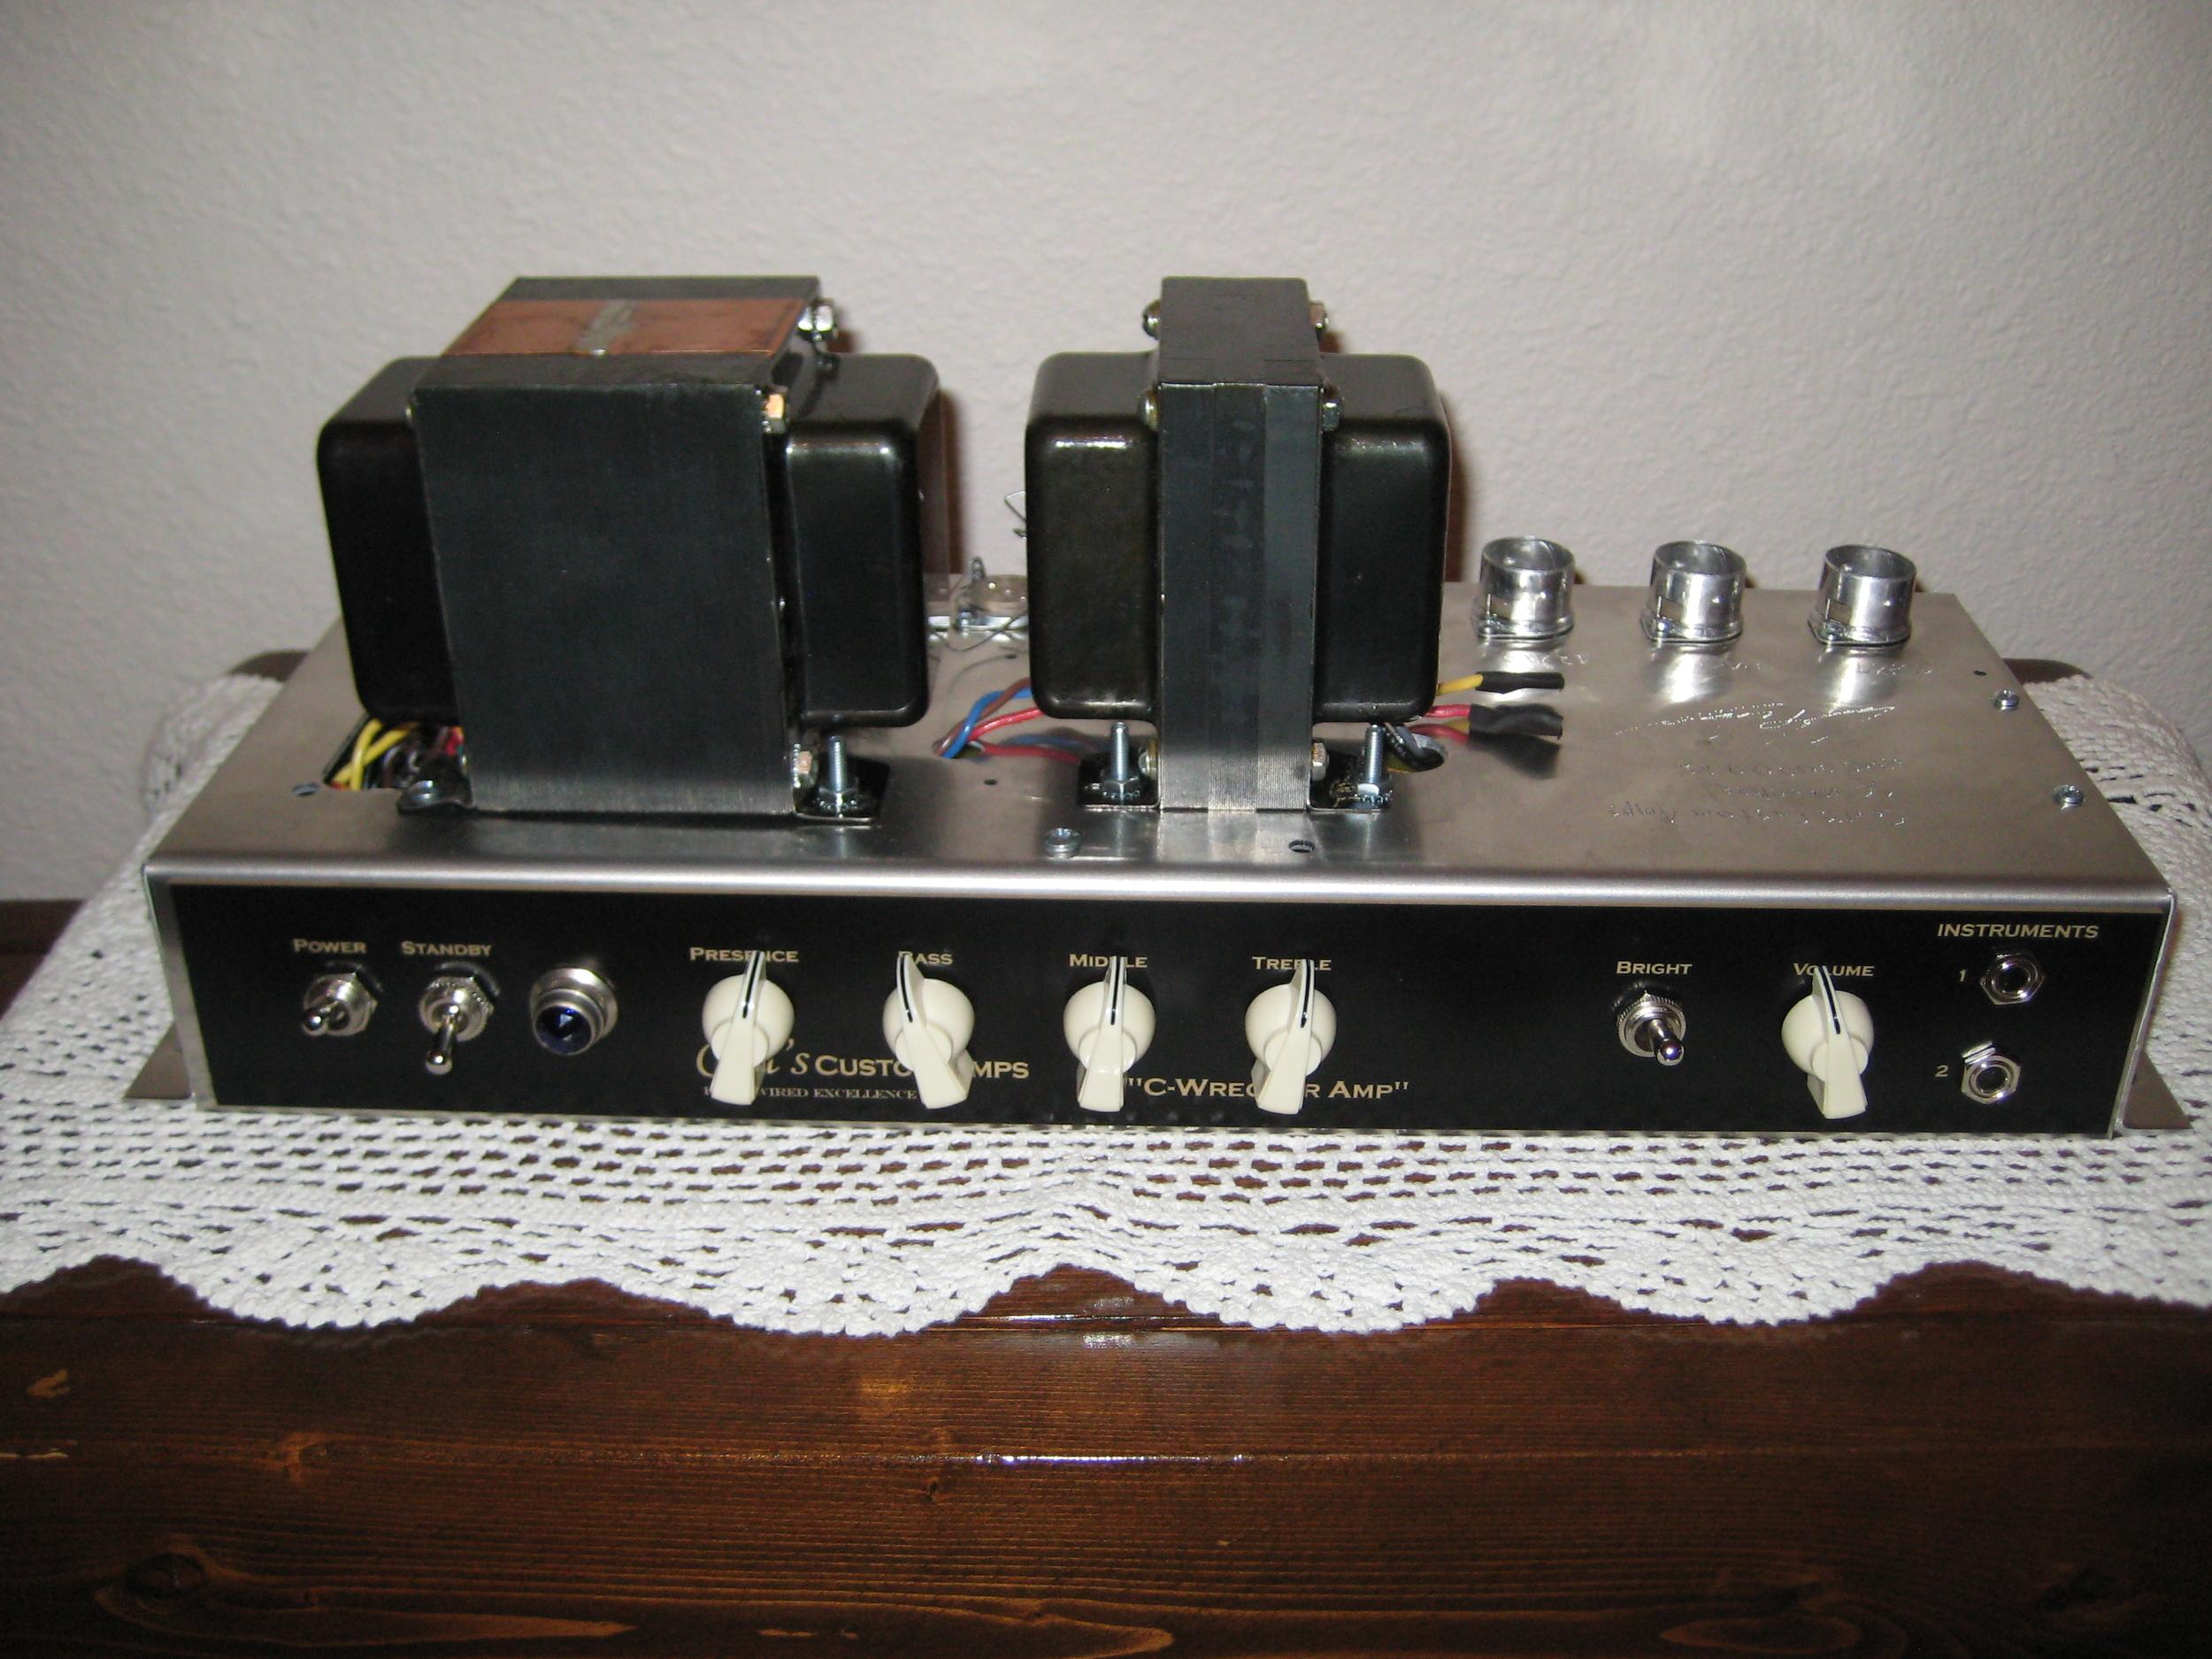 Trainwreck Liverpool style amp! 30 watt of twang and crunch!